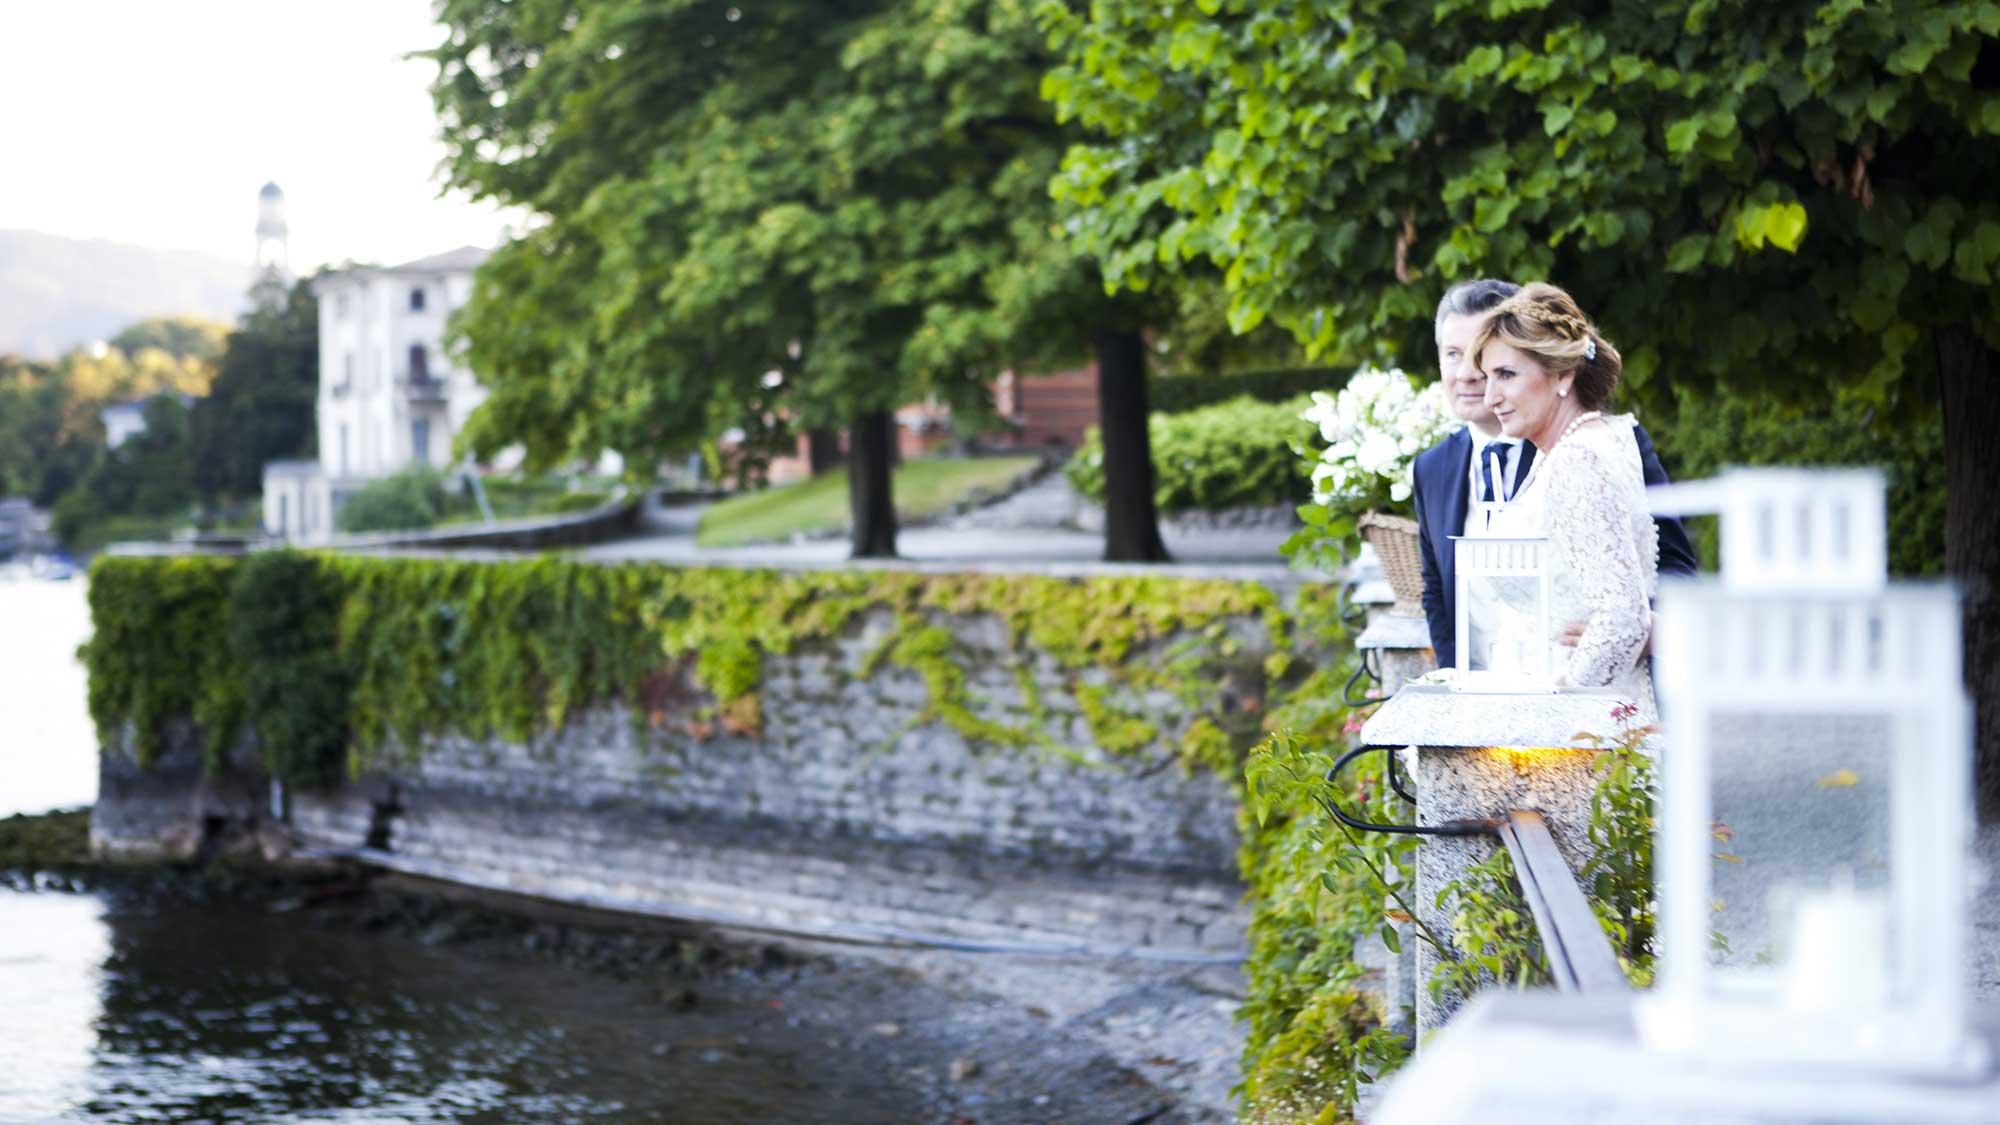 villadeste_wedding_photographers_011